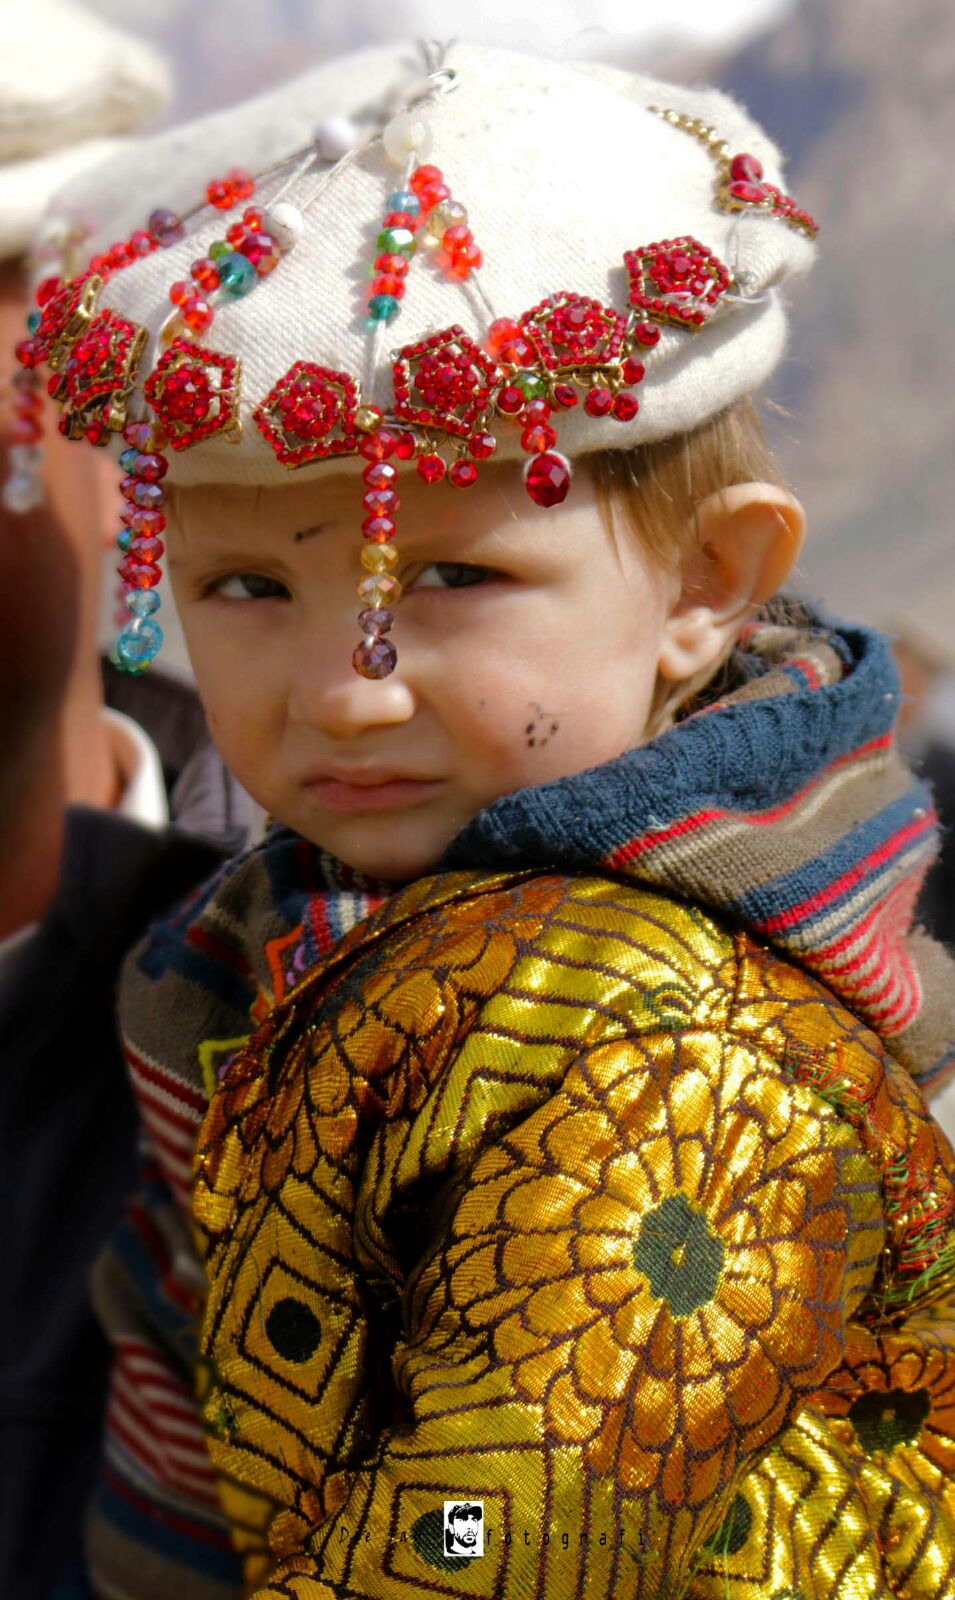 A cute child dressed for the occasion. Photo: Deedar Ali